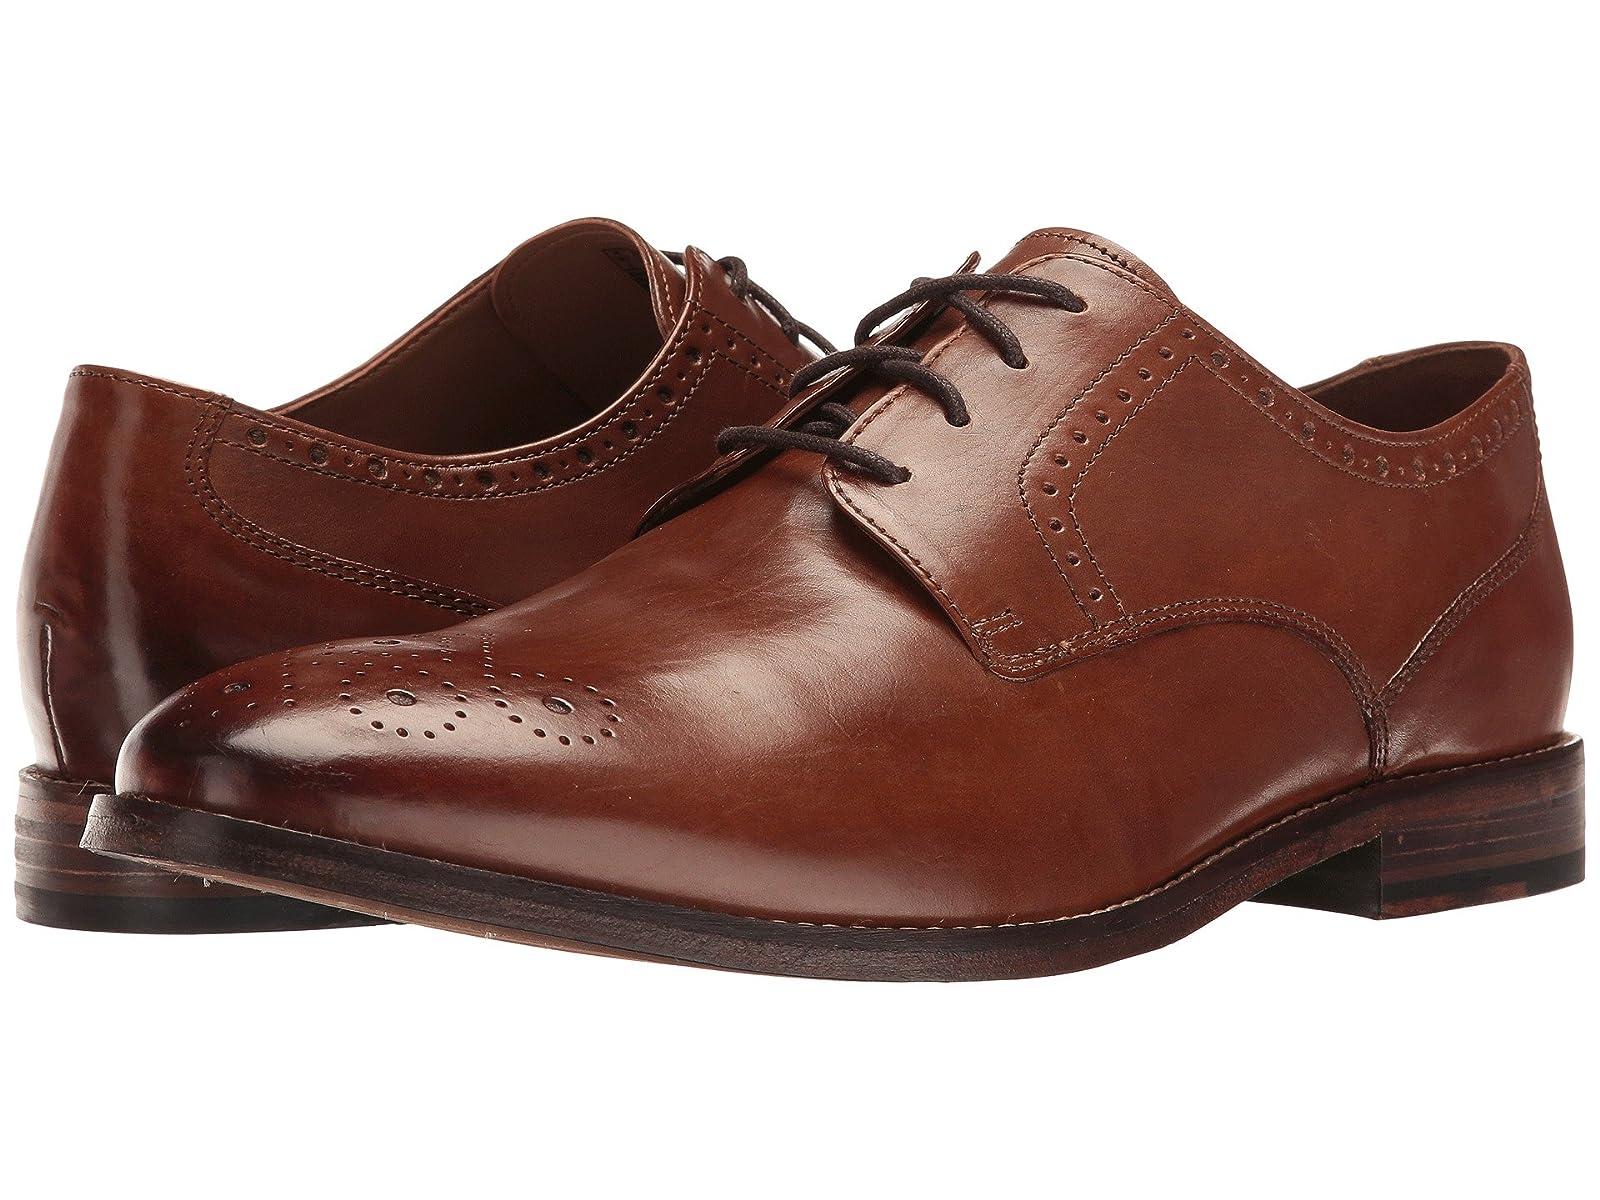 Bostonian Ensboro PlainCheap and distinctive eye-catching shoes